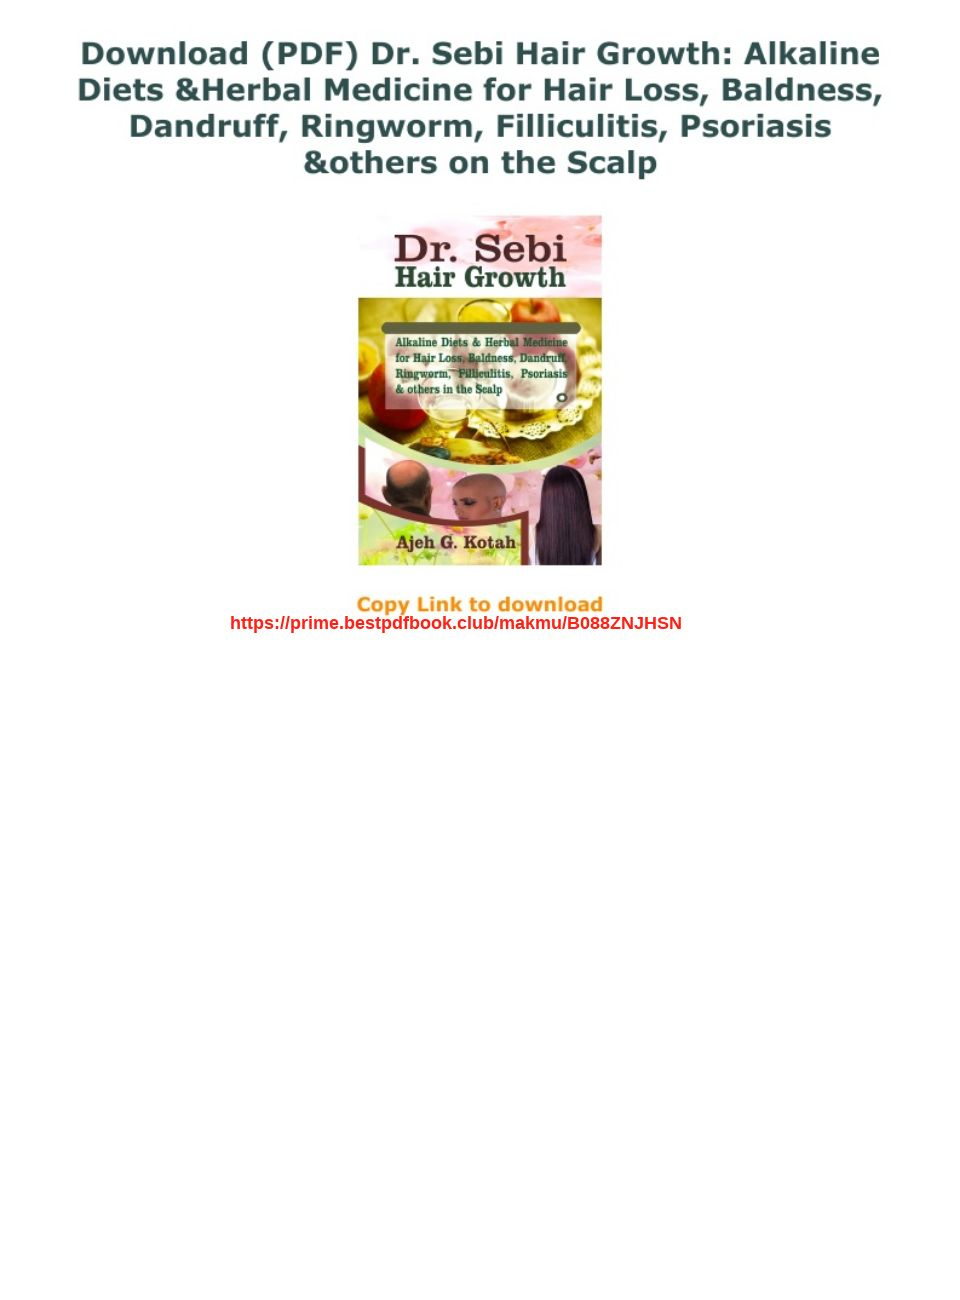 Dr Sebi Alkaline Herbal Medicine Pdf